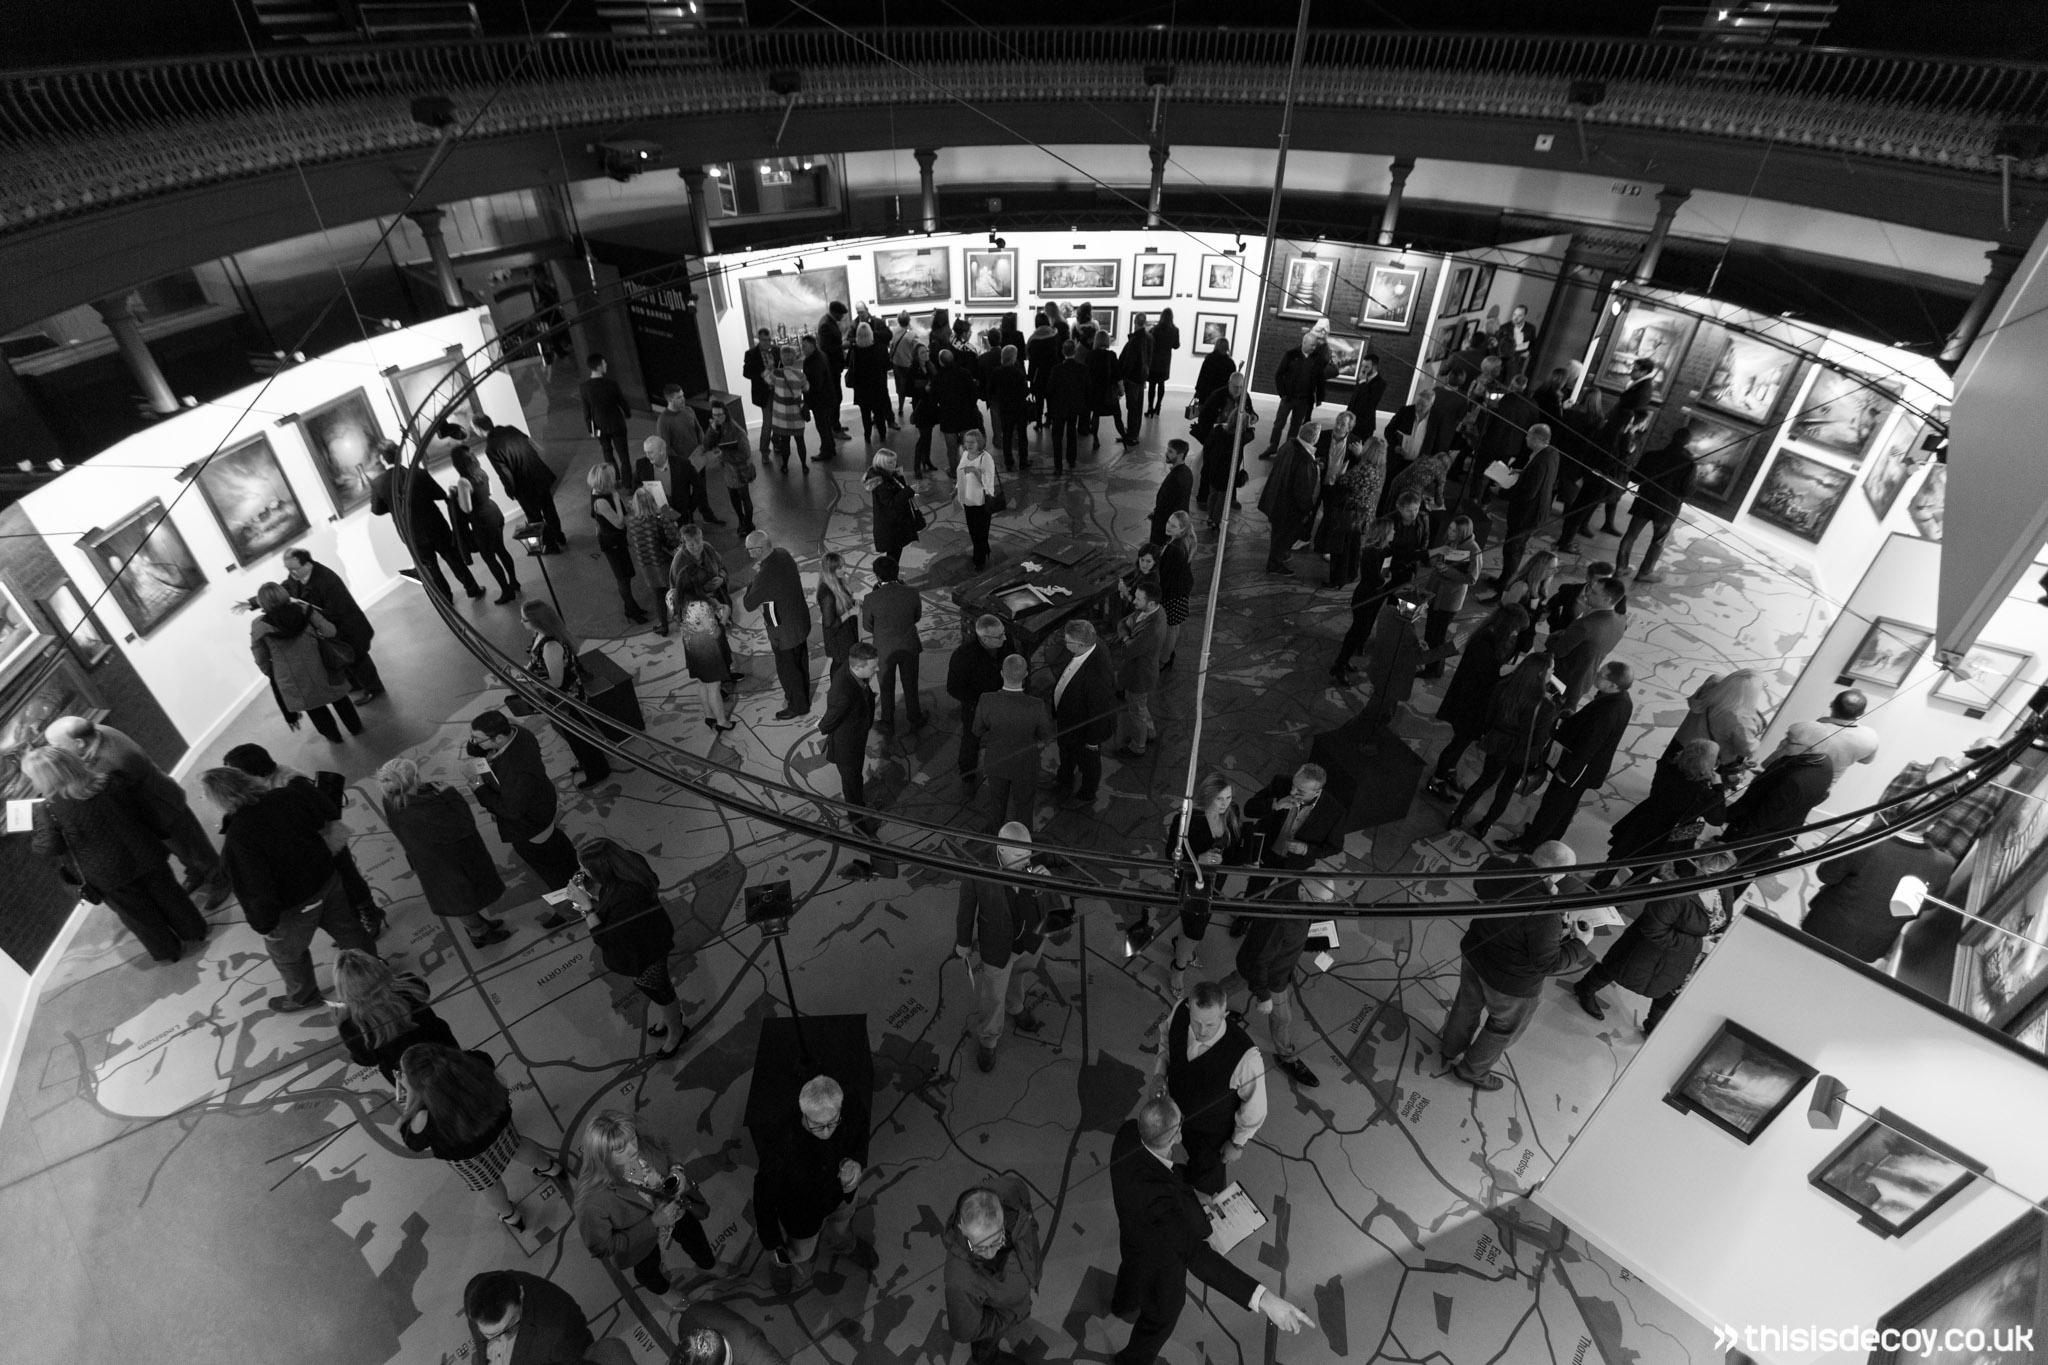 Northern Light - Bob Barker - Leeds City Museum - 20 Jan 17 - Decoy Media - 10.jpg